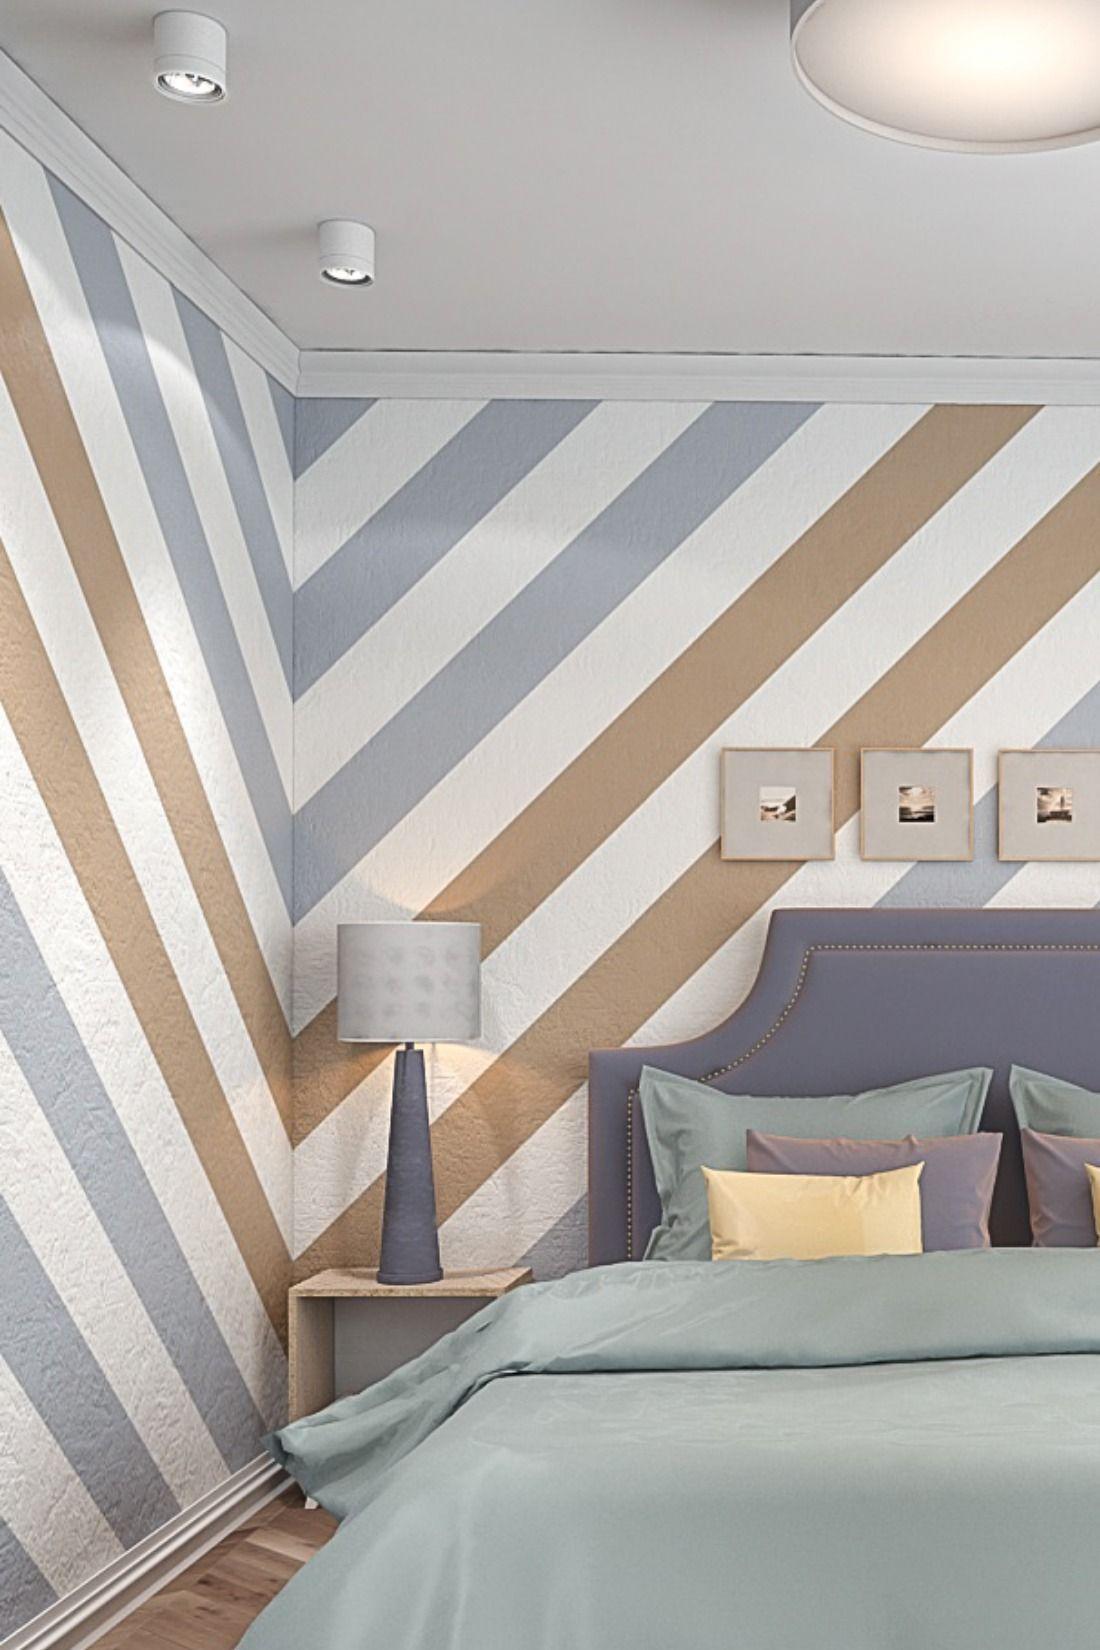 Stripes Wall Stencil Allover Wall Stencils Bedroom Wall Paint Bedroom Wall Designs Striped Walls